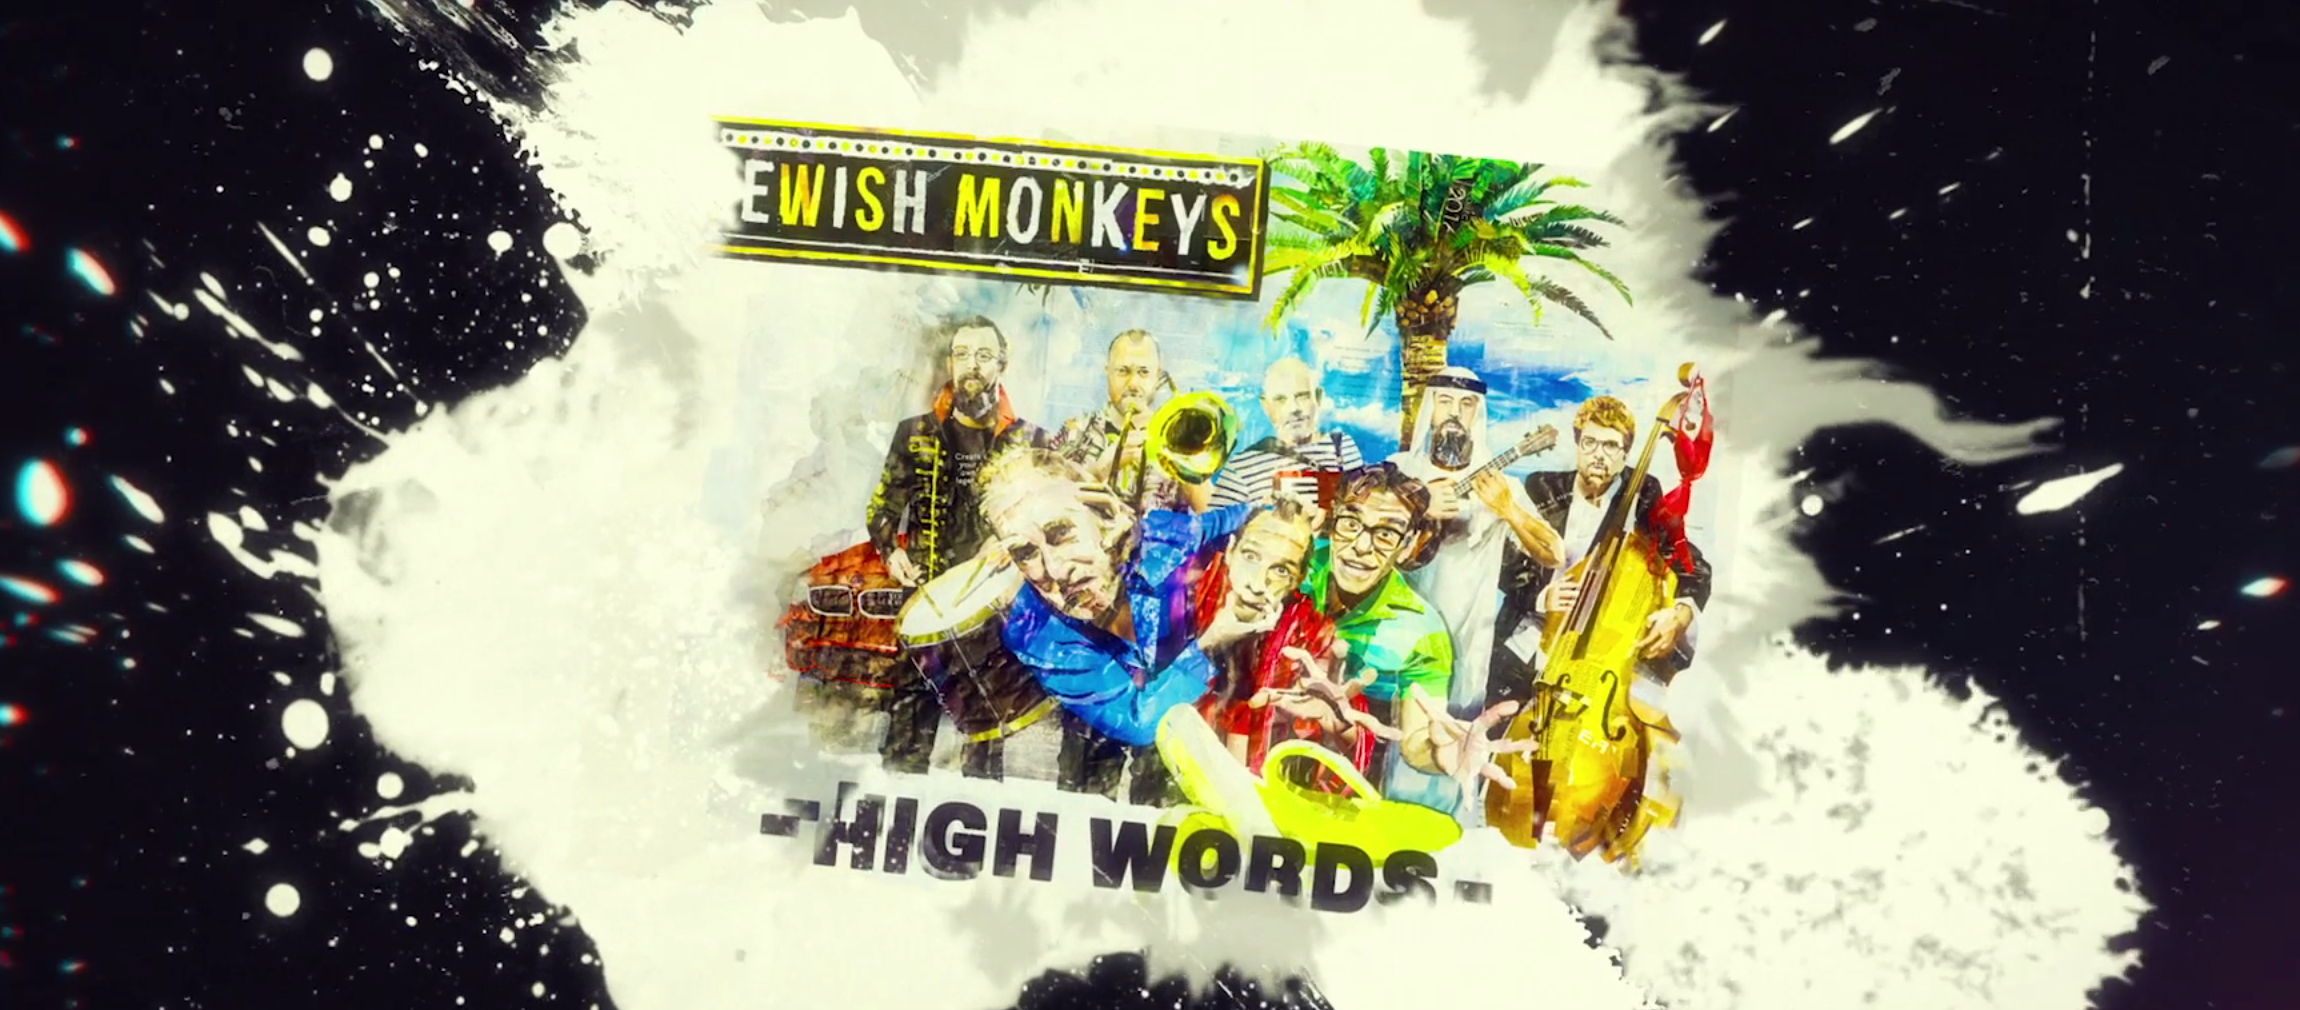 Jewish Monkeys   greedy for best music